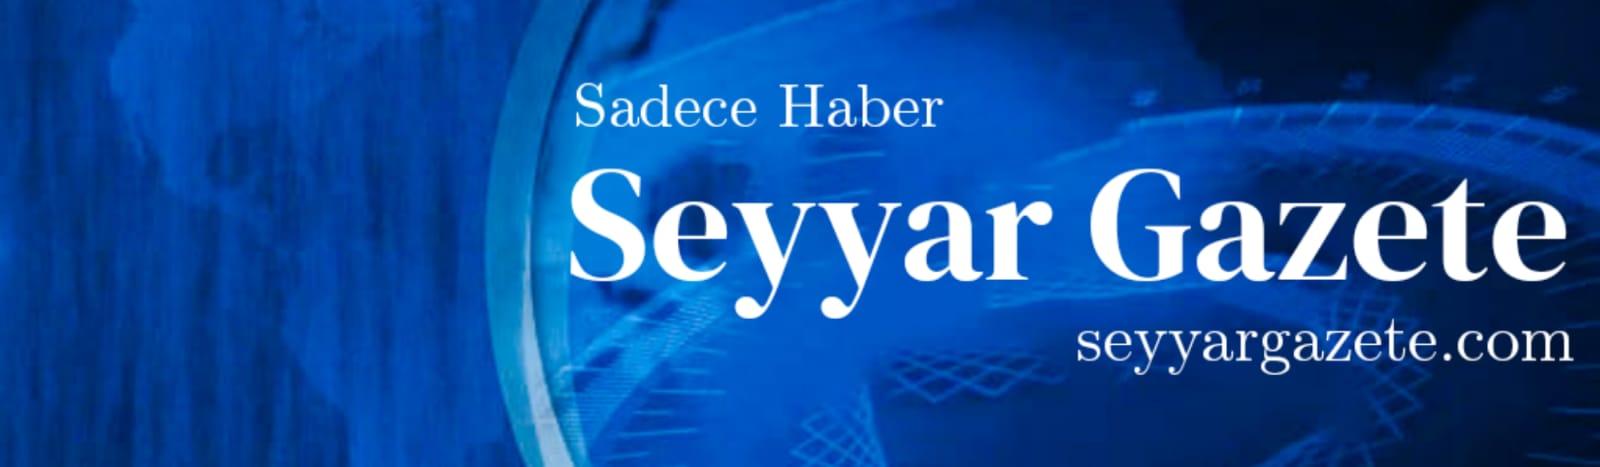 Seyyar Gazete